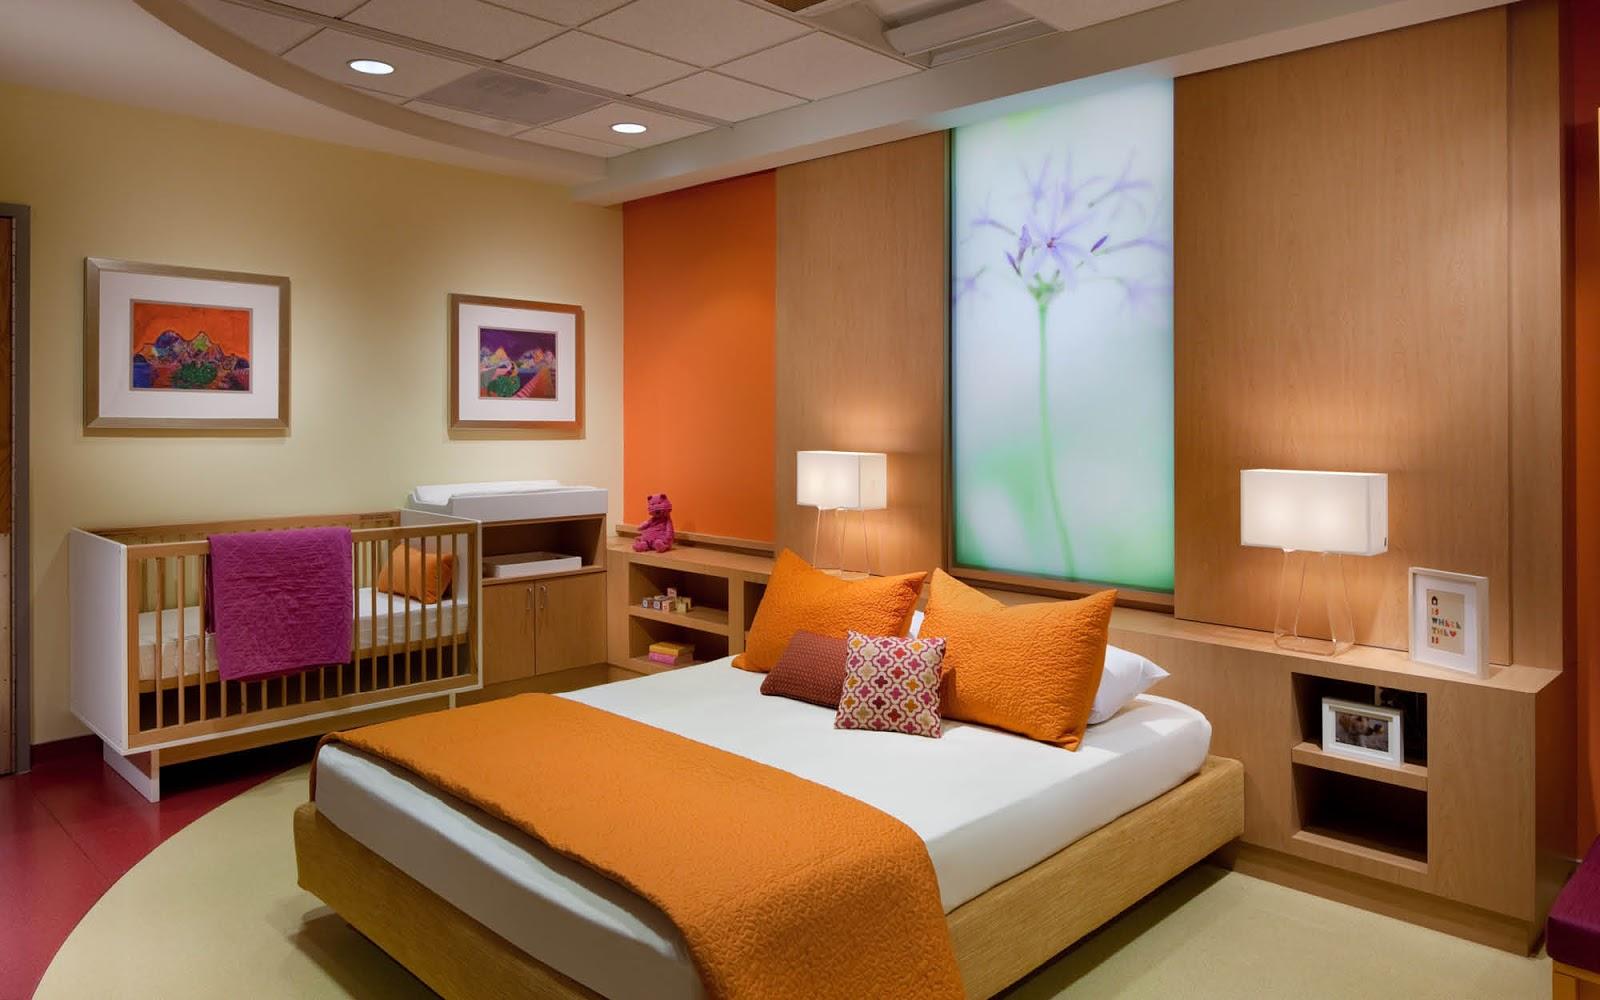 HOME & HOSPITAL ROOM FURNITURE & EQUIPMENT